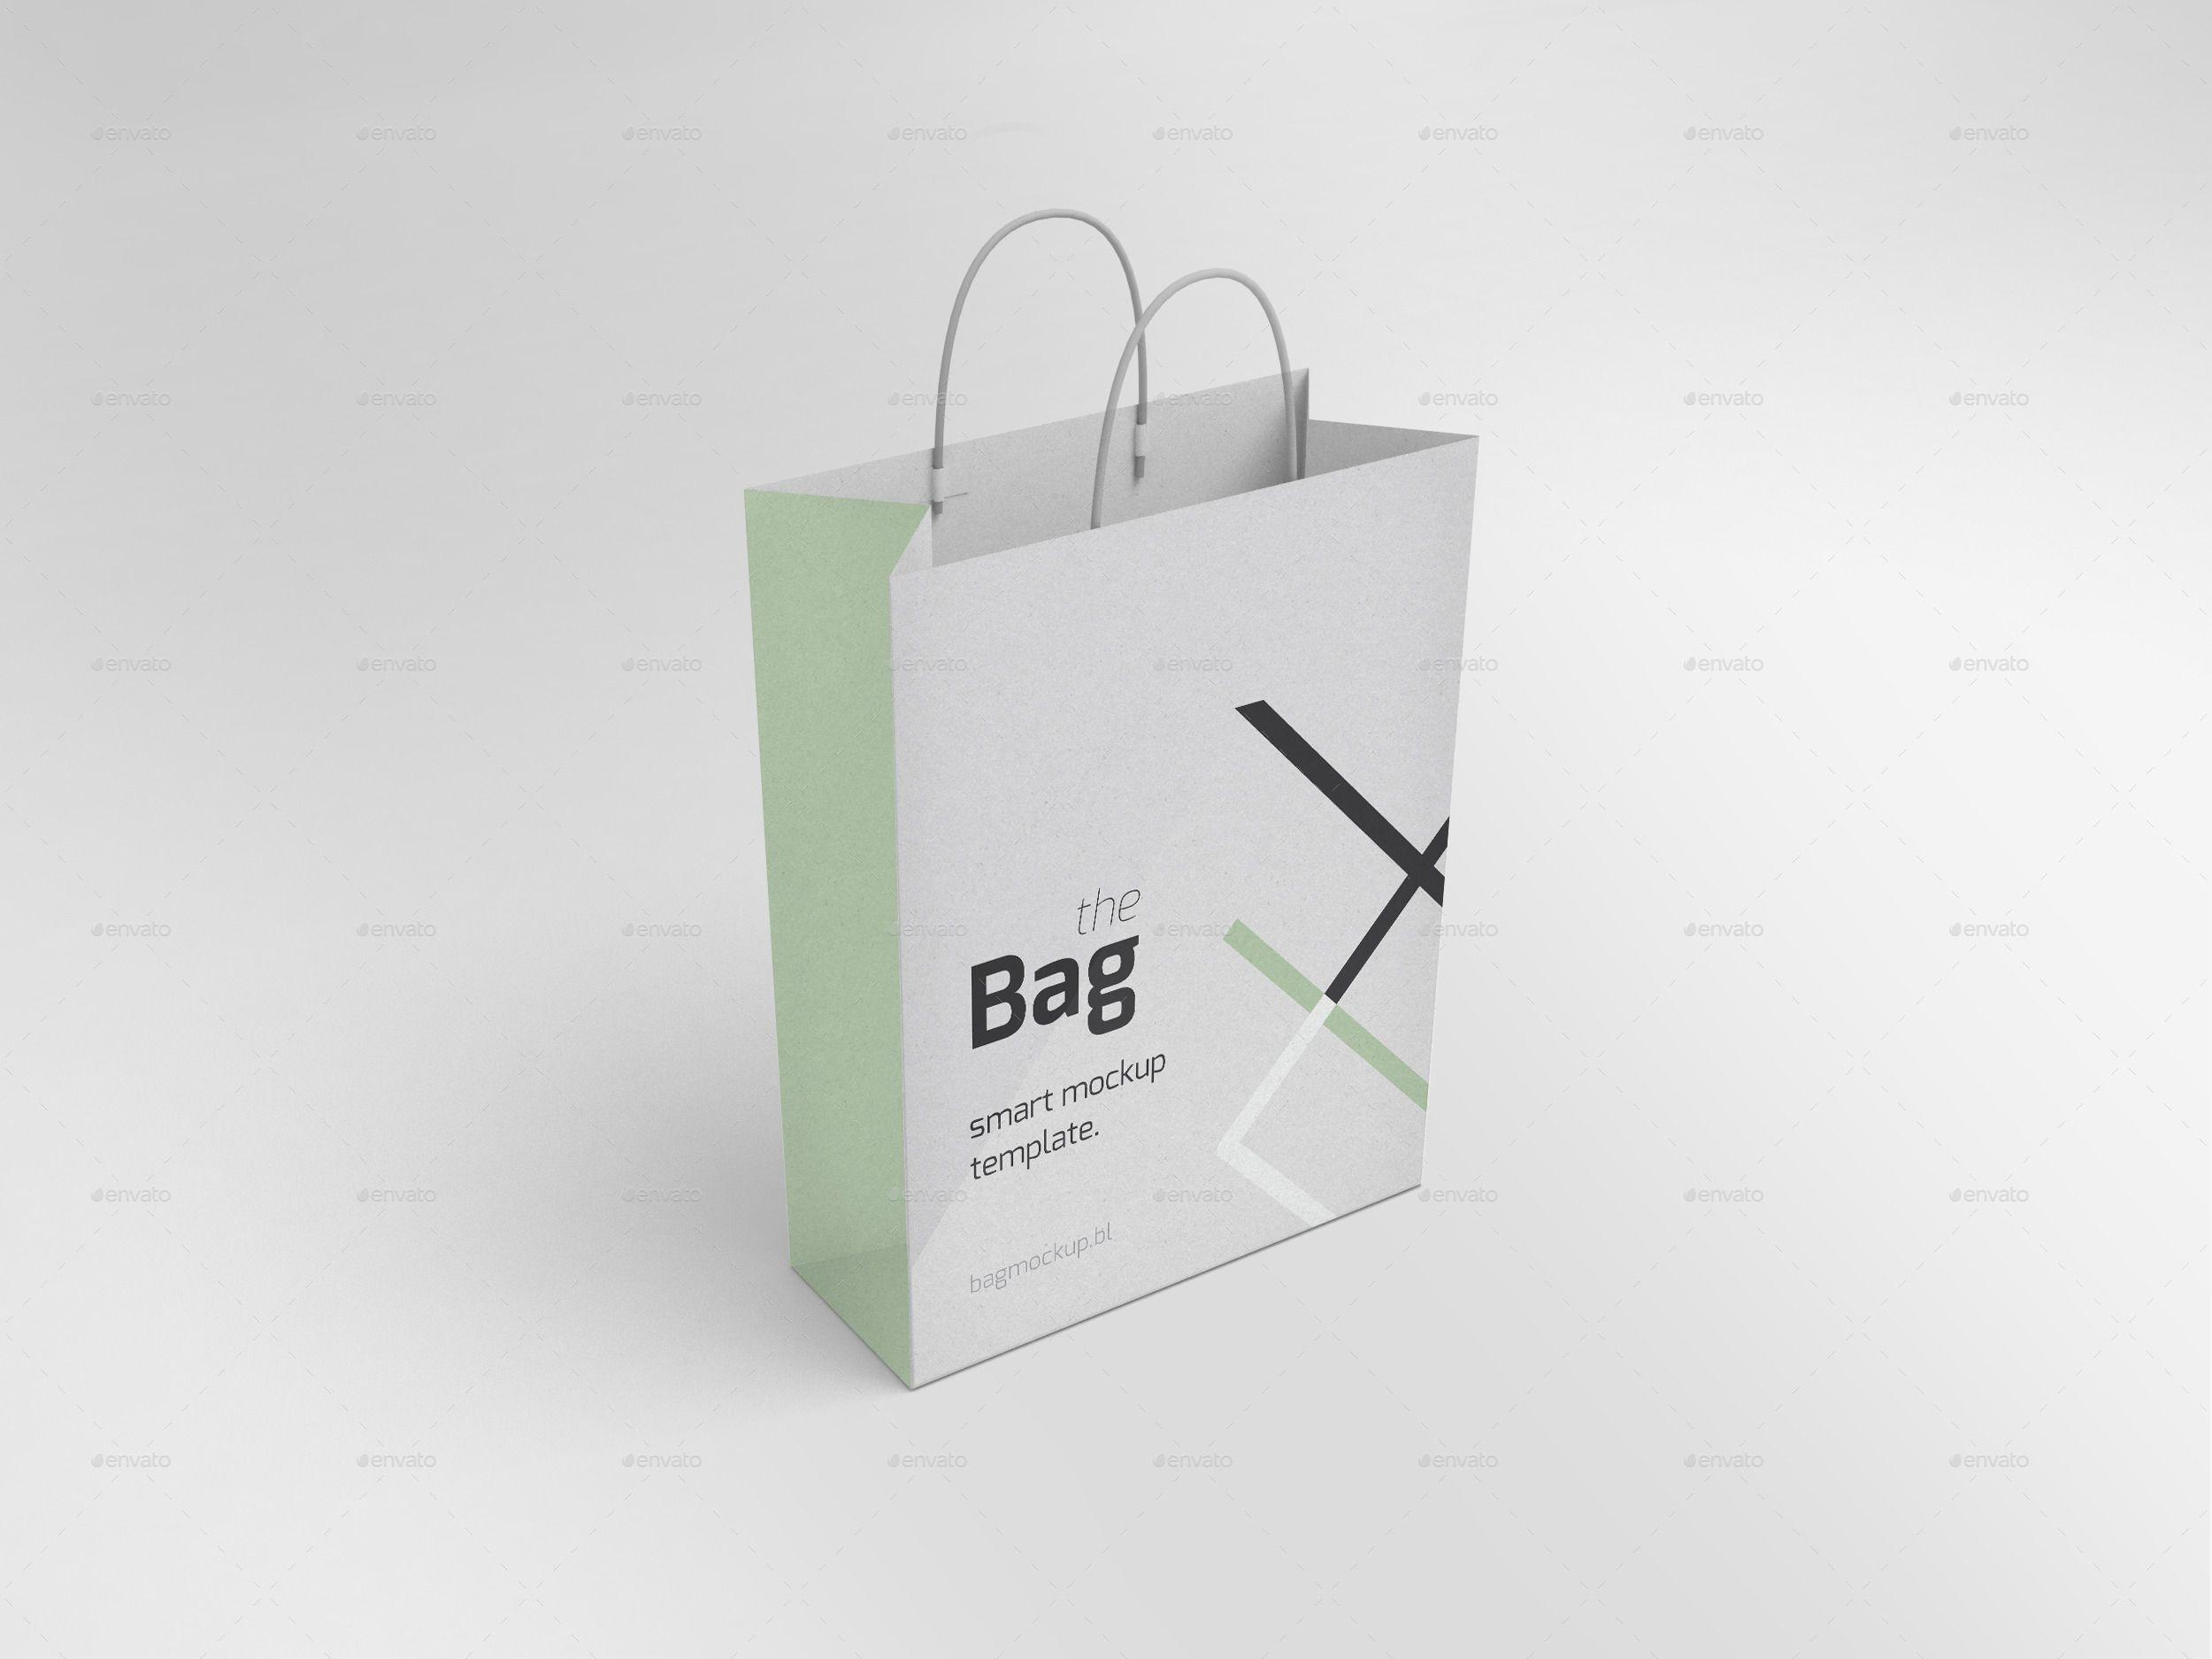 Download 5 Shopping Bag Mockups Bag Mockup Free Graphic Design Clip Art Freebies